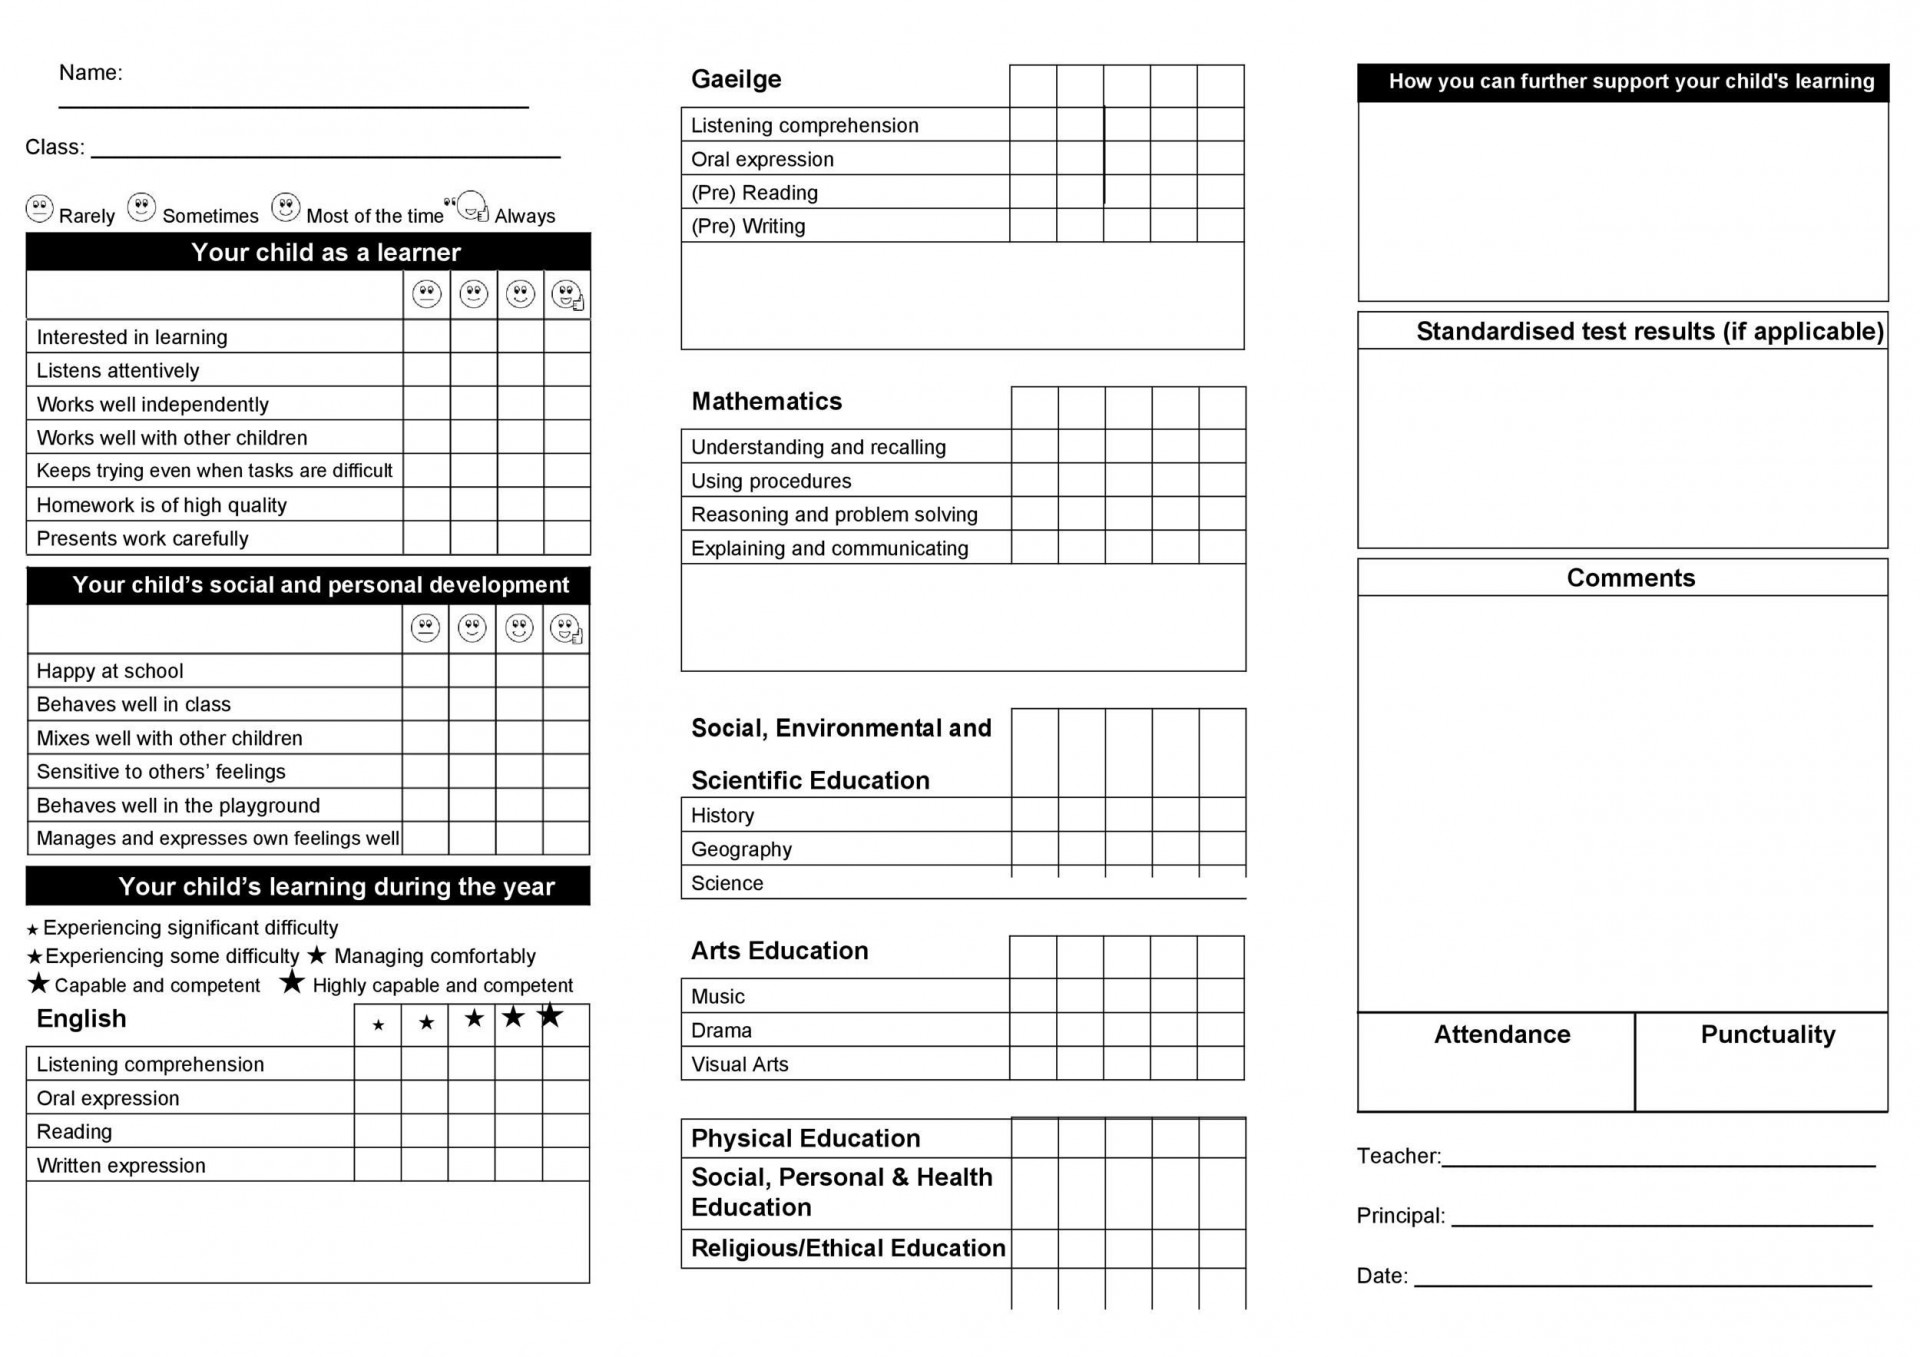 009 Amazing Homeschool Middle School Report Card Template Inspiration  8th Grade Transcript1920